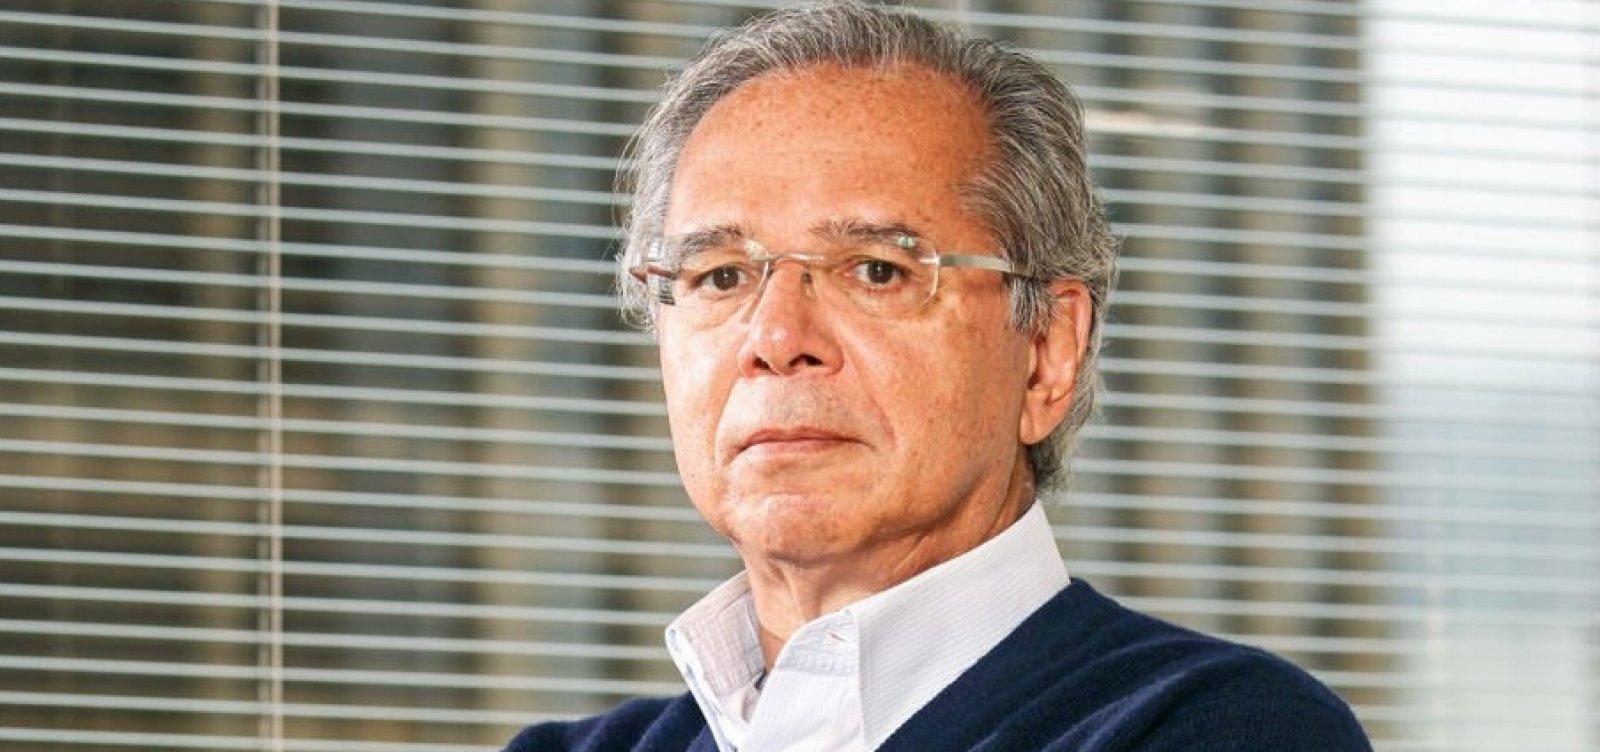 Procuradoria investiga Paulo Guedes sob suspeita de fraude